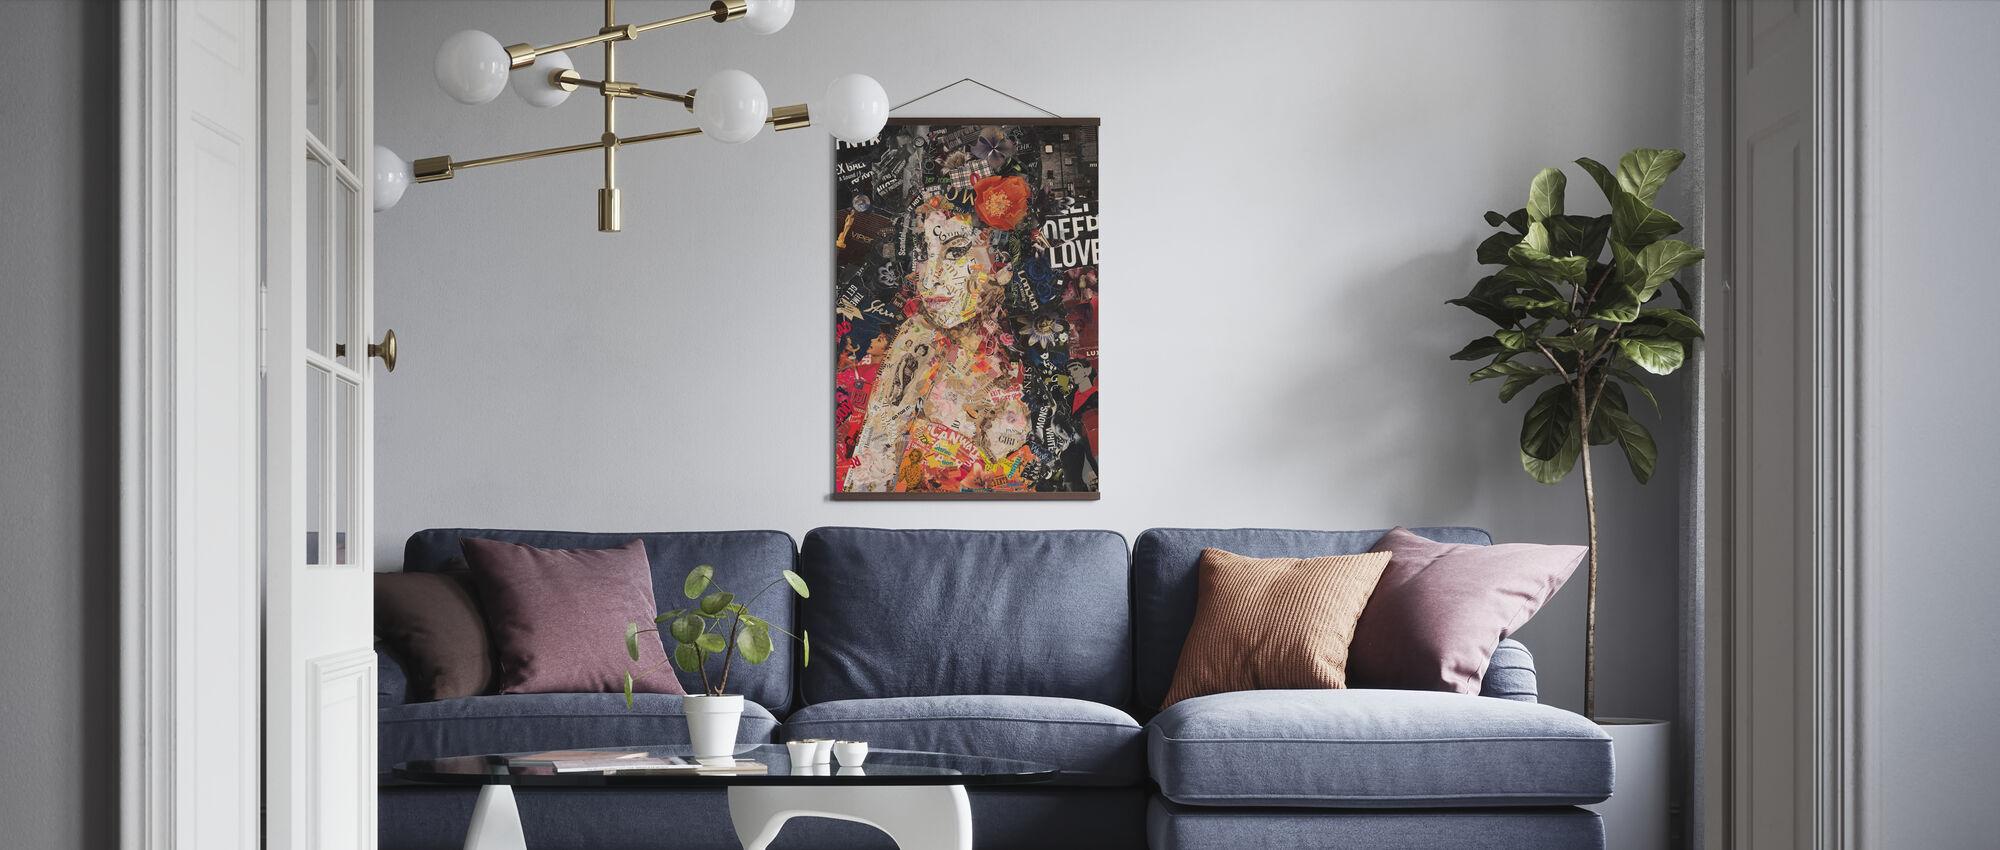 Back to Black - Poster - Living Room